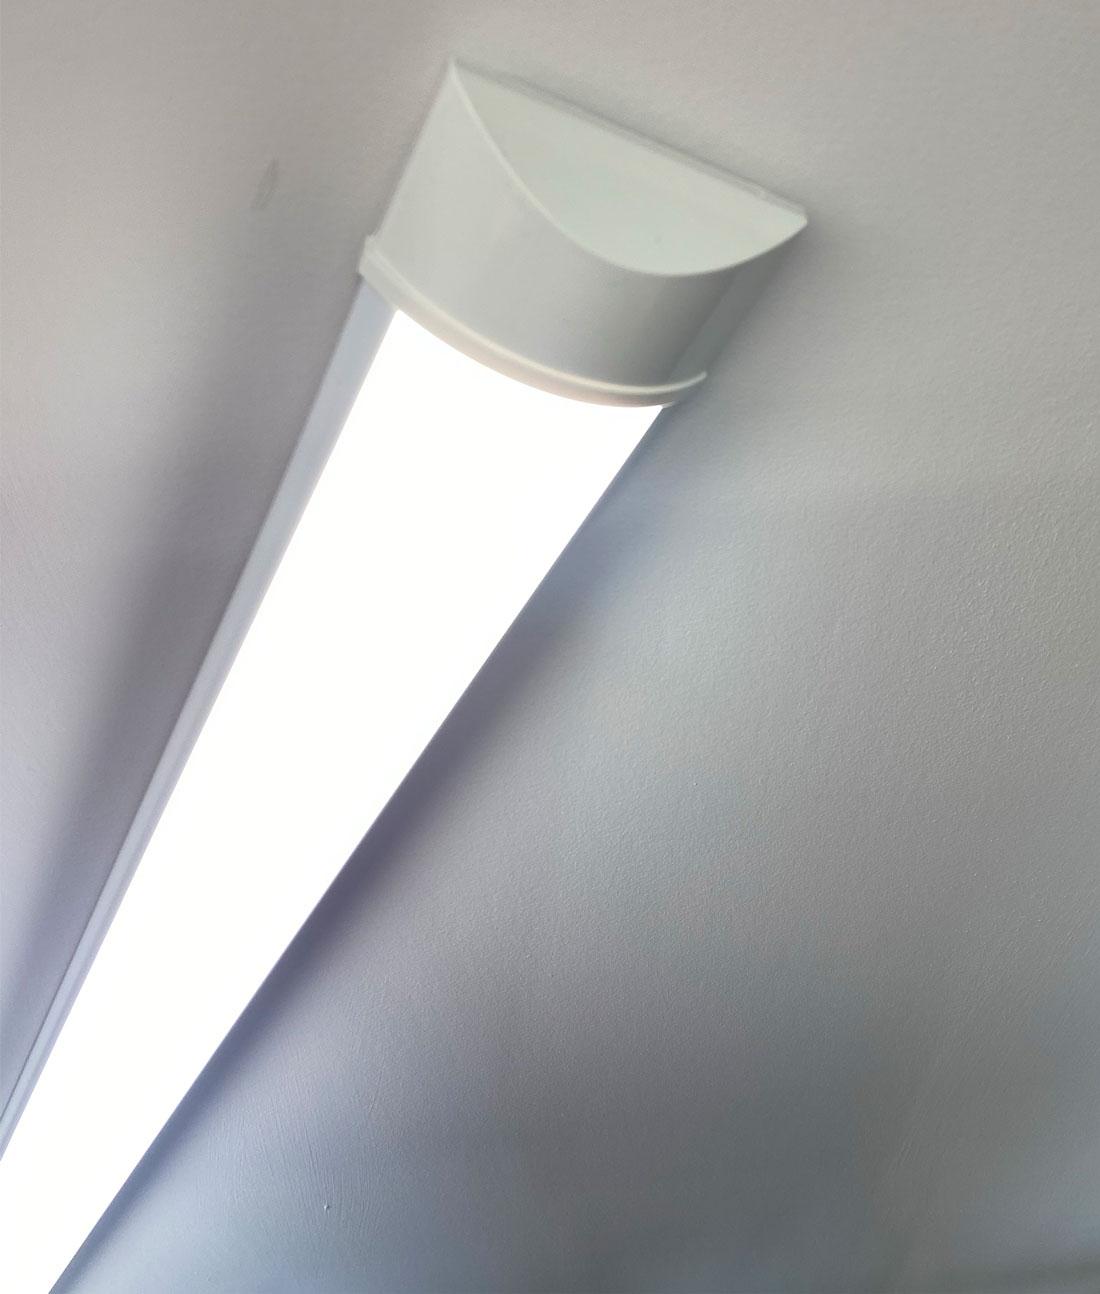 Modern Led Light For Kitchens Great Alternative To Older Fluorescent